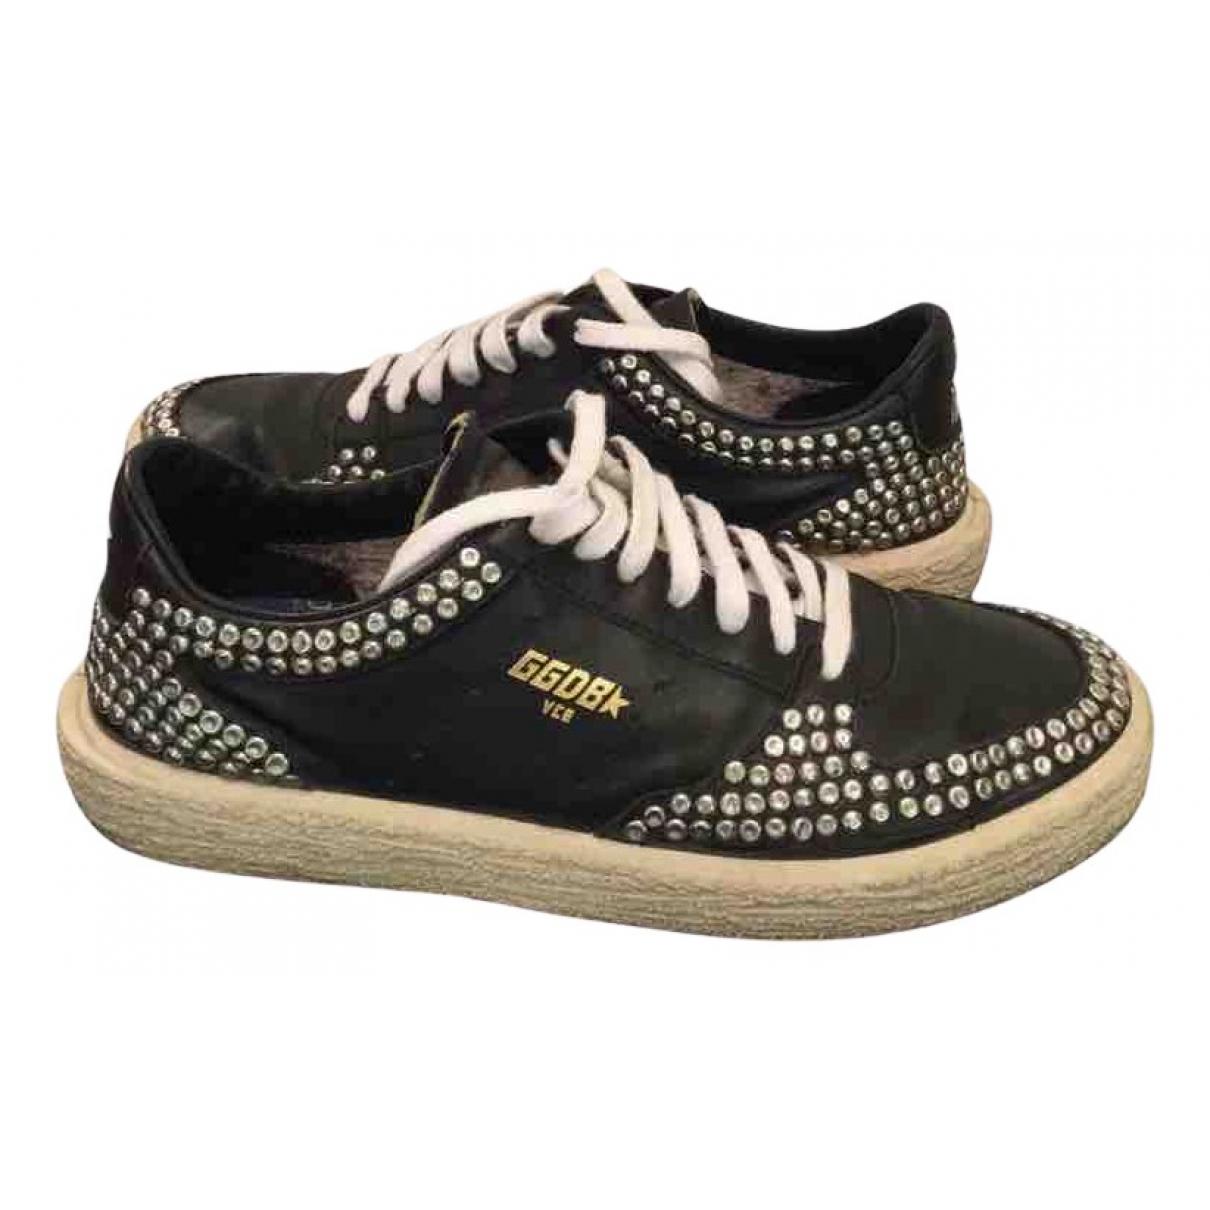 Golden Goose - Baskets Tenthstar pour femme en cuir - noir